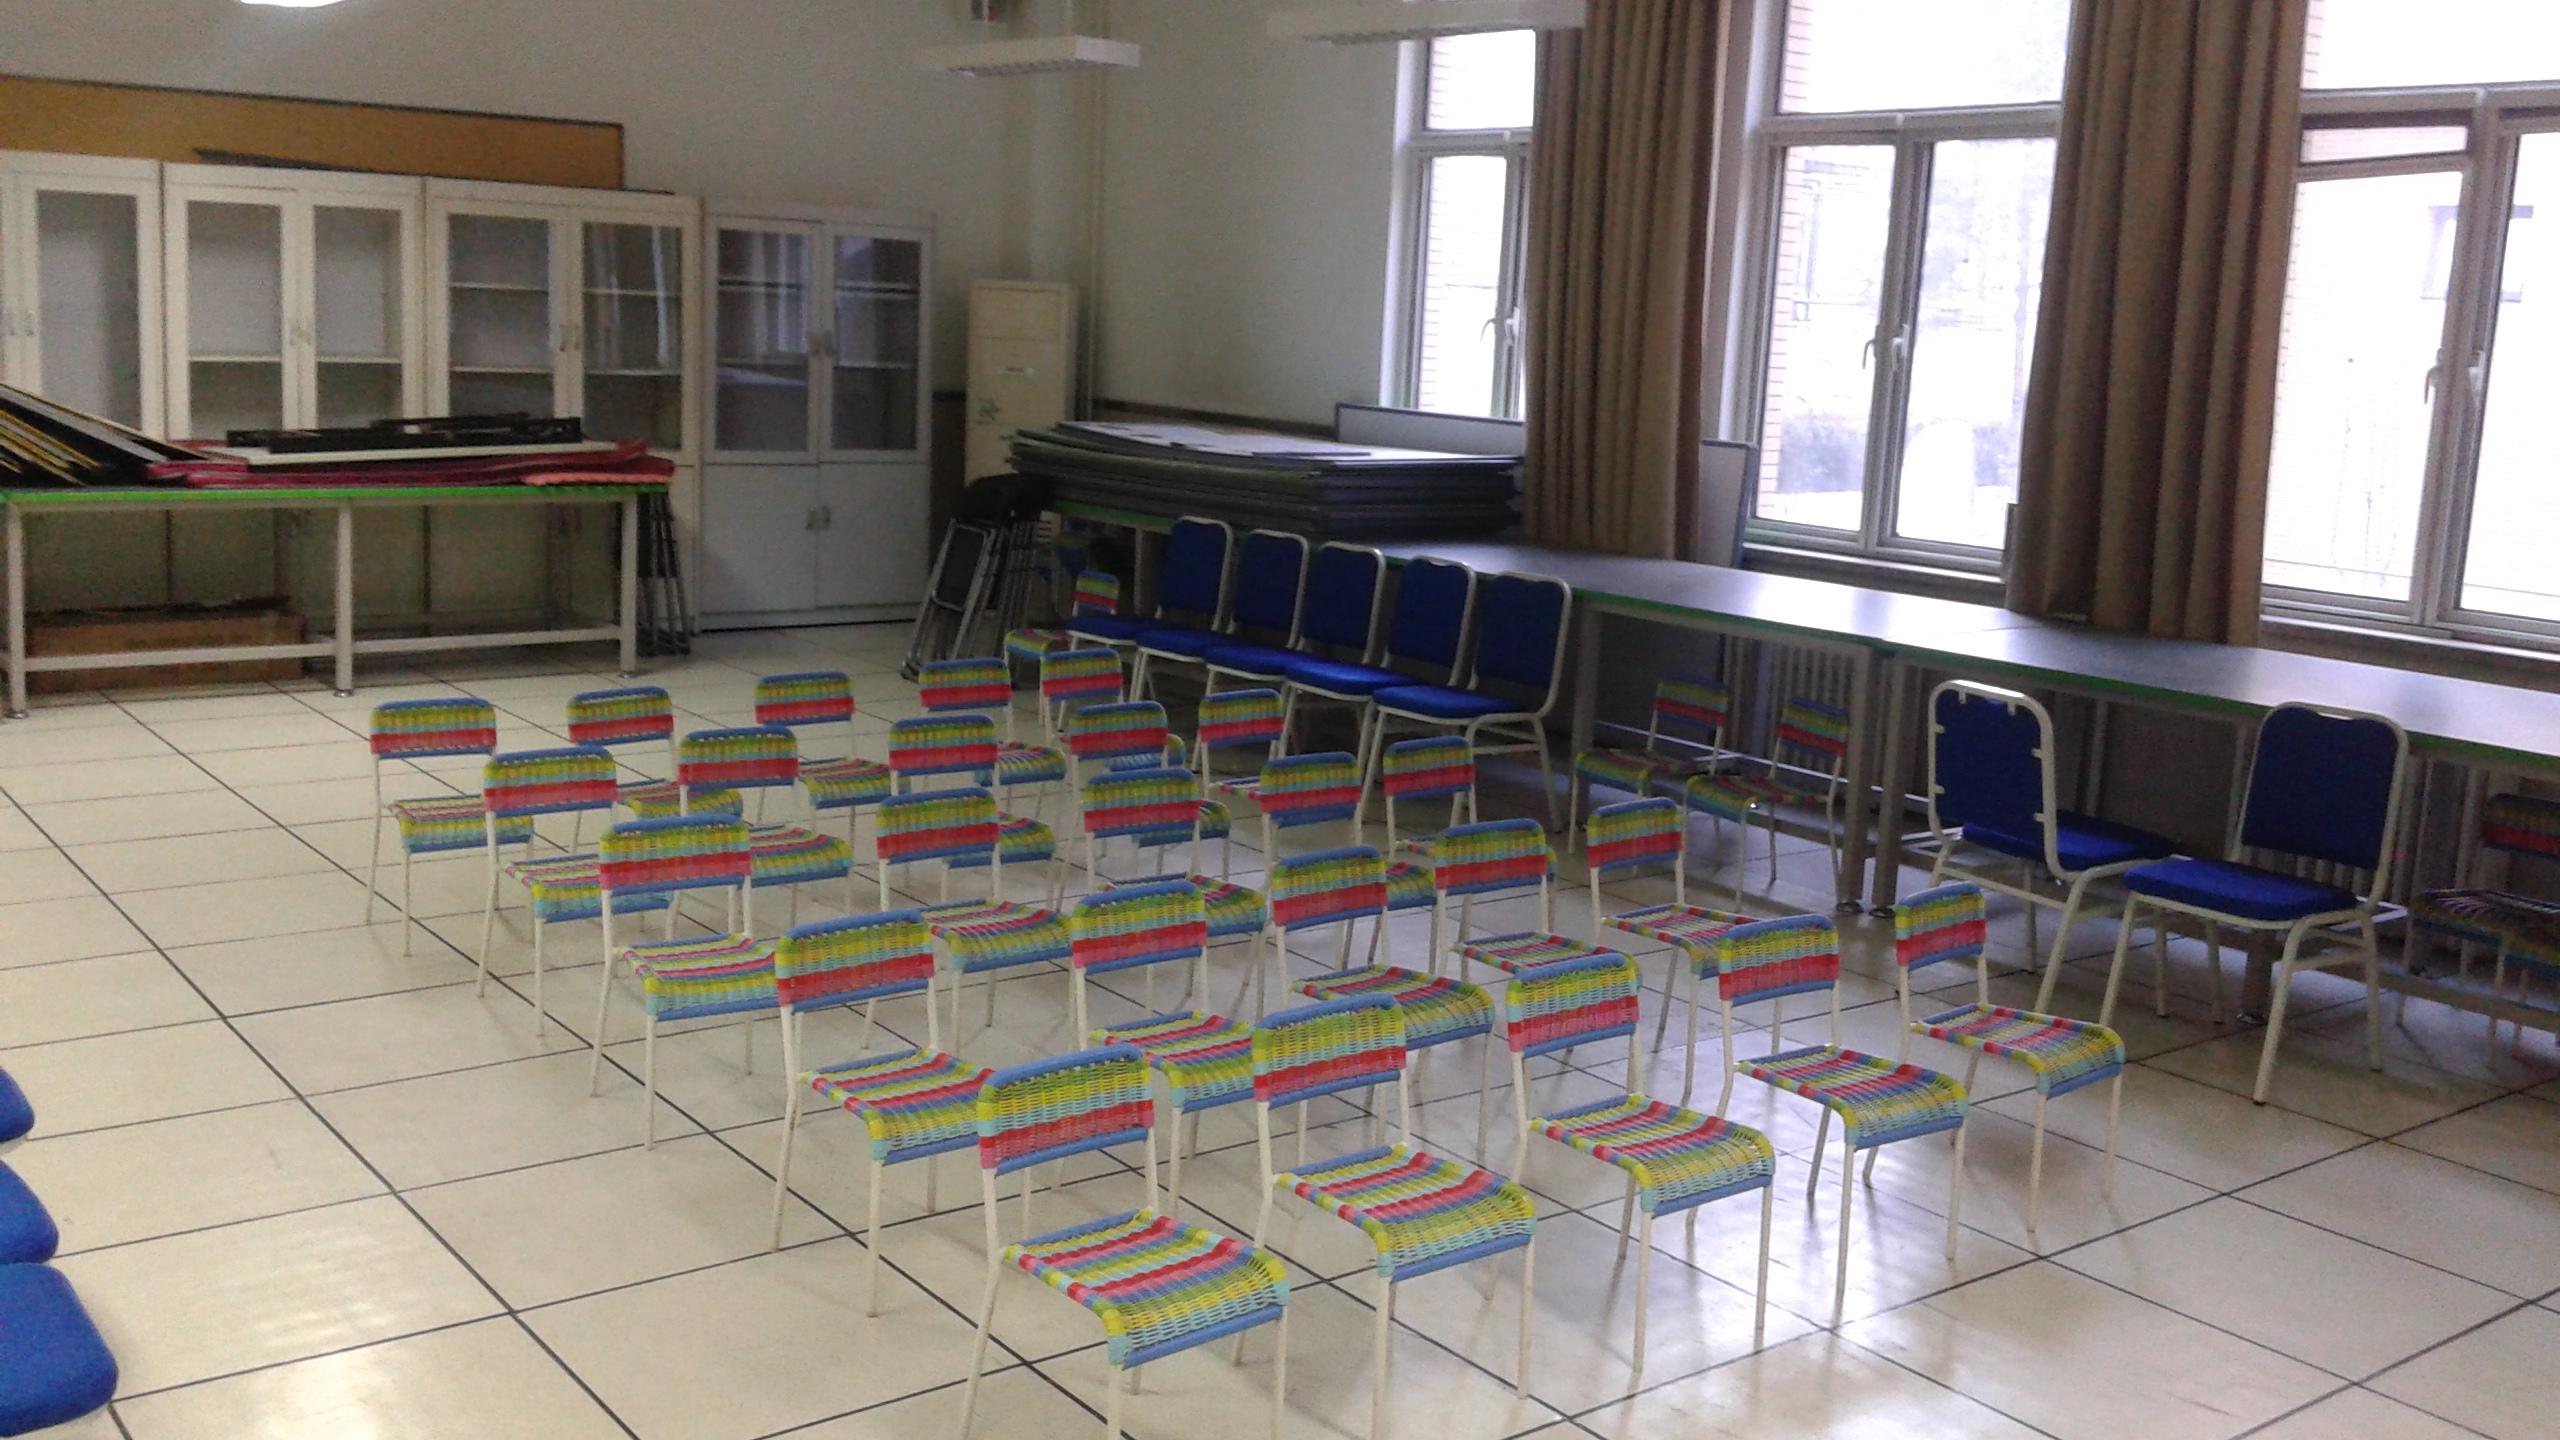 Tim's Classroom